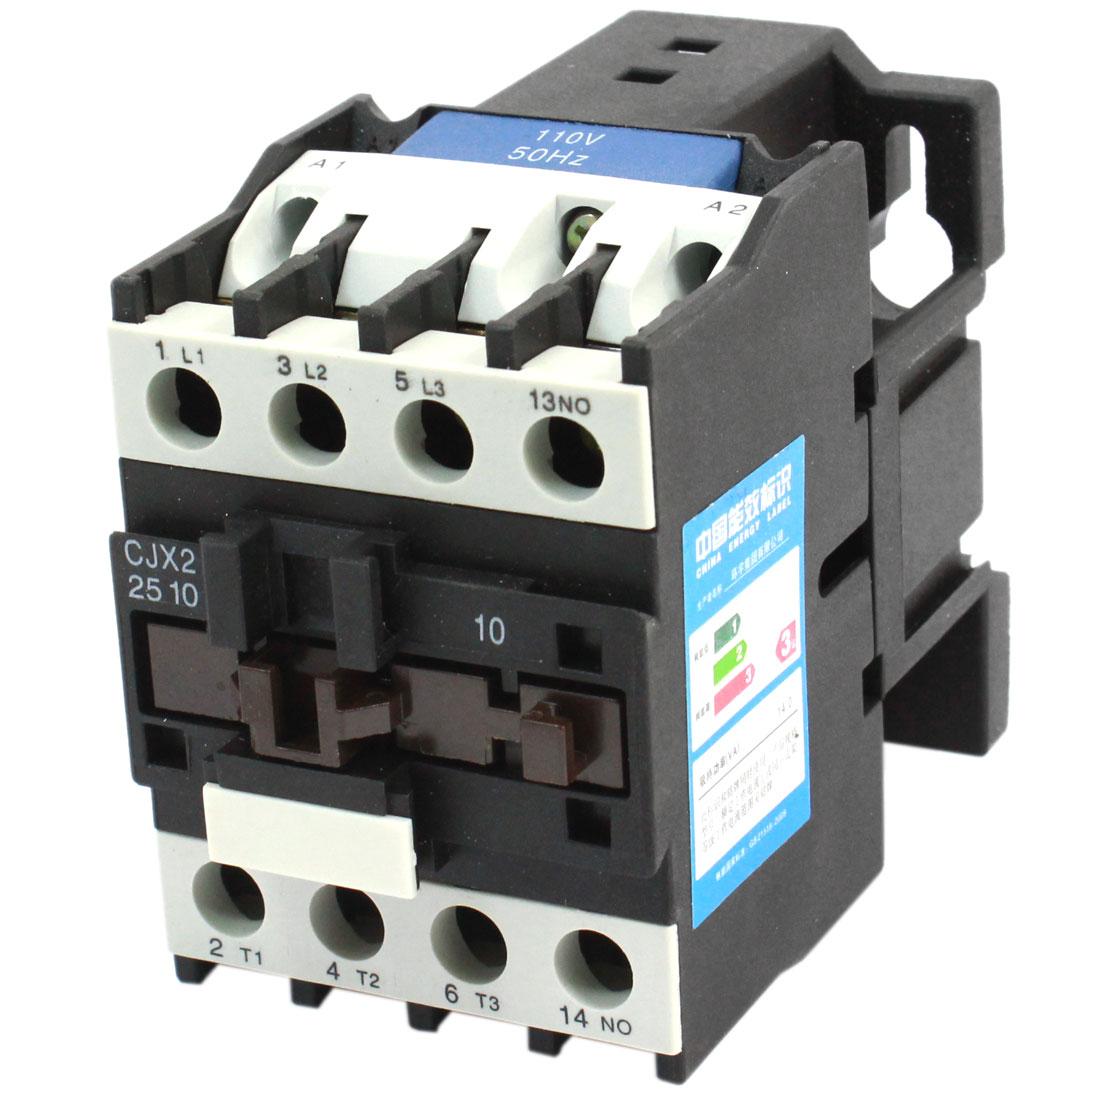 CJX2-2510 Motor Control AC Contactor 25A 3 Pole Coil 110V 50Hz